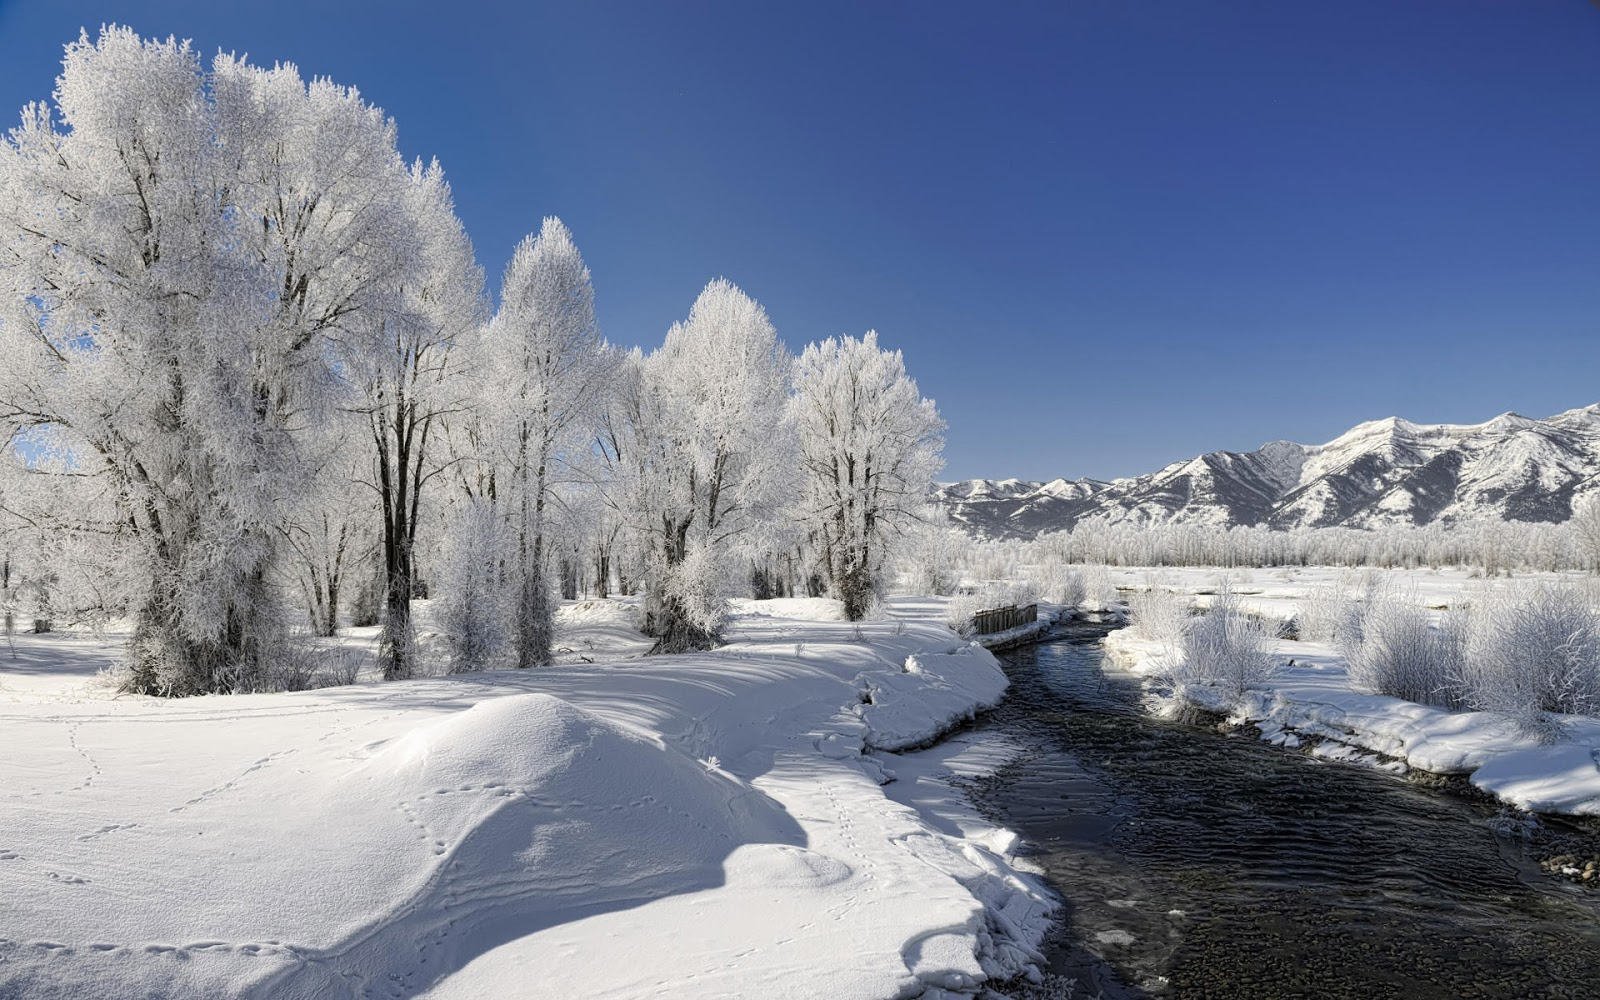 Winter season Nature beautiful HD Desktop wallpapers Natural High 1600x1000